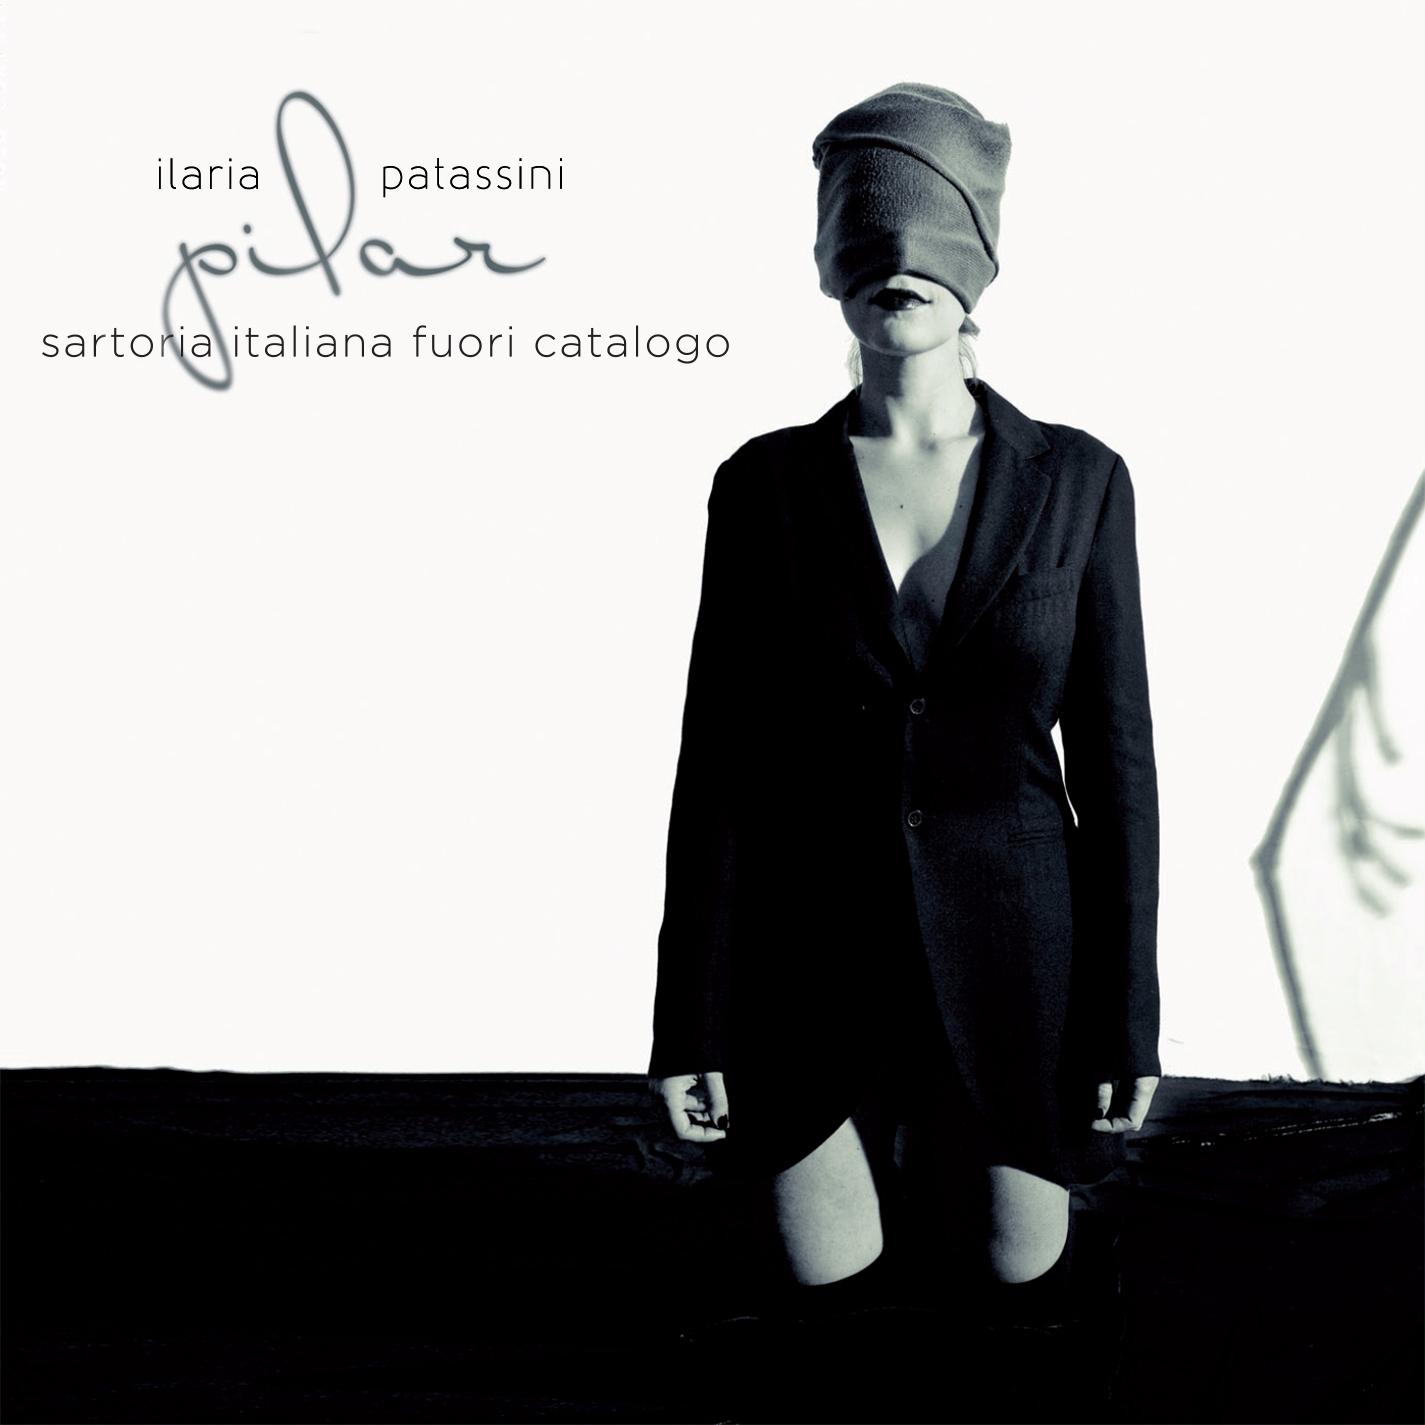 cover - Sartoria italiana - Ilaria Pilar Patassini